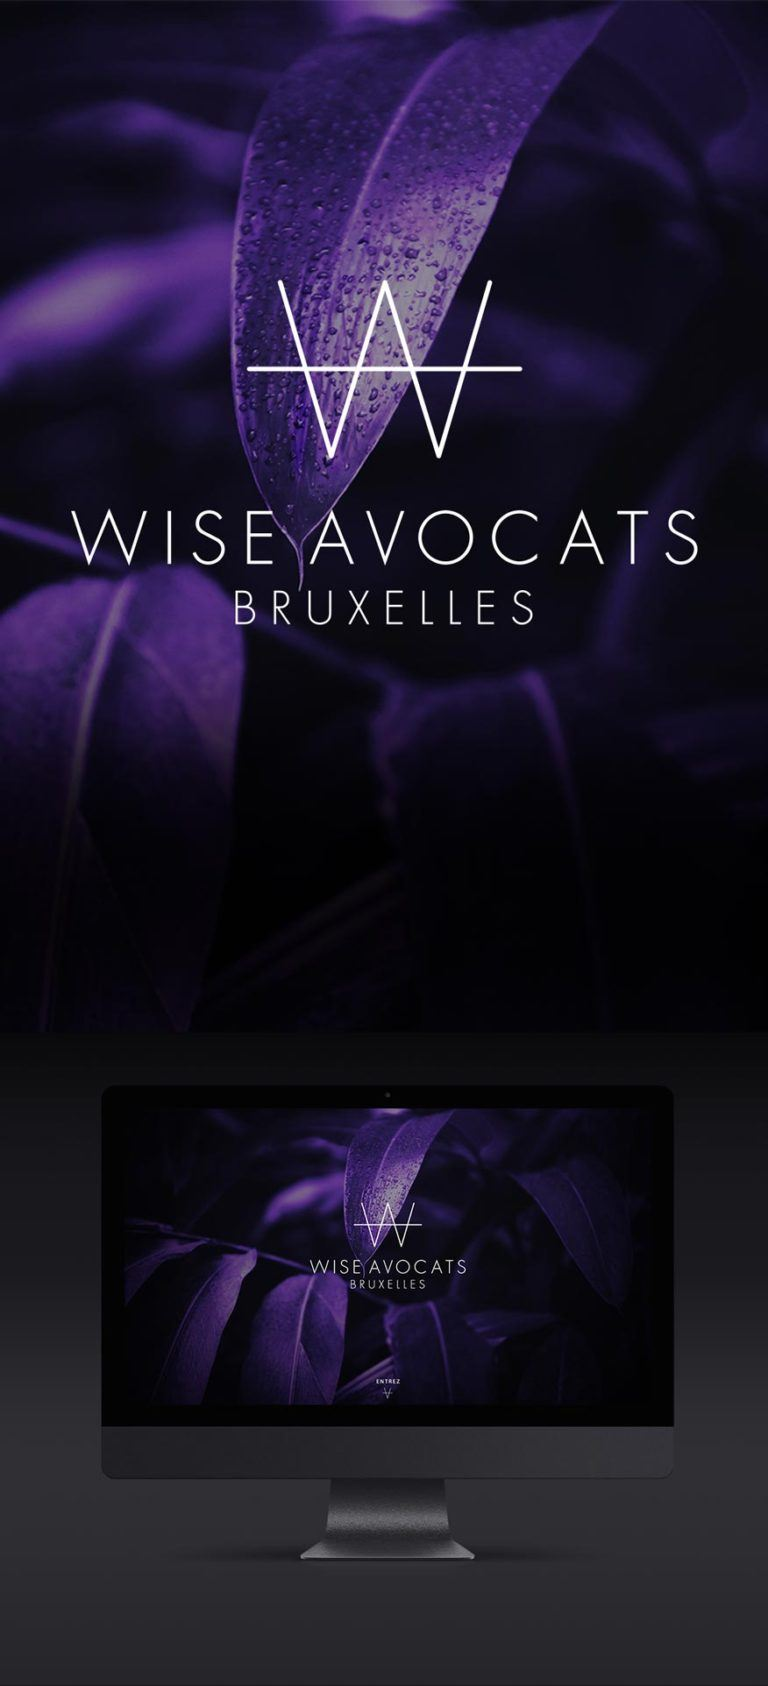 Wise Avocats